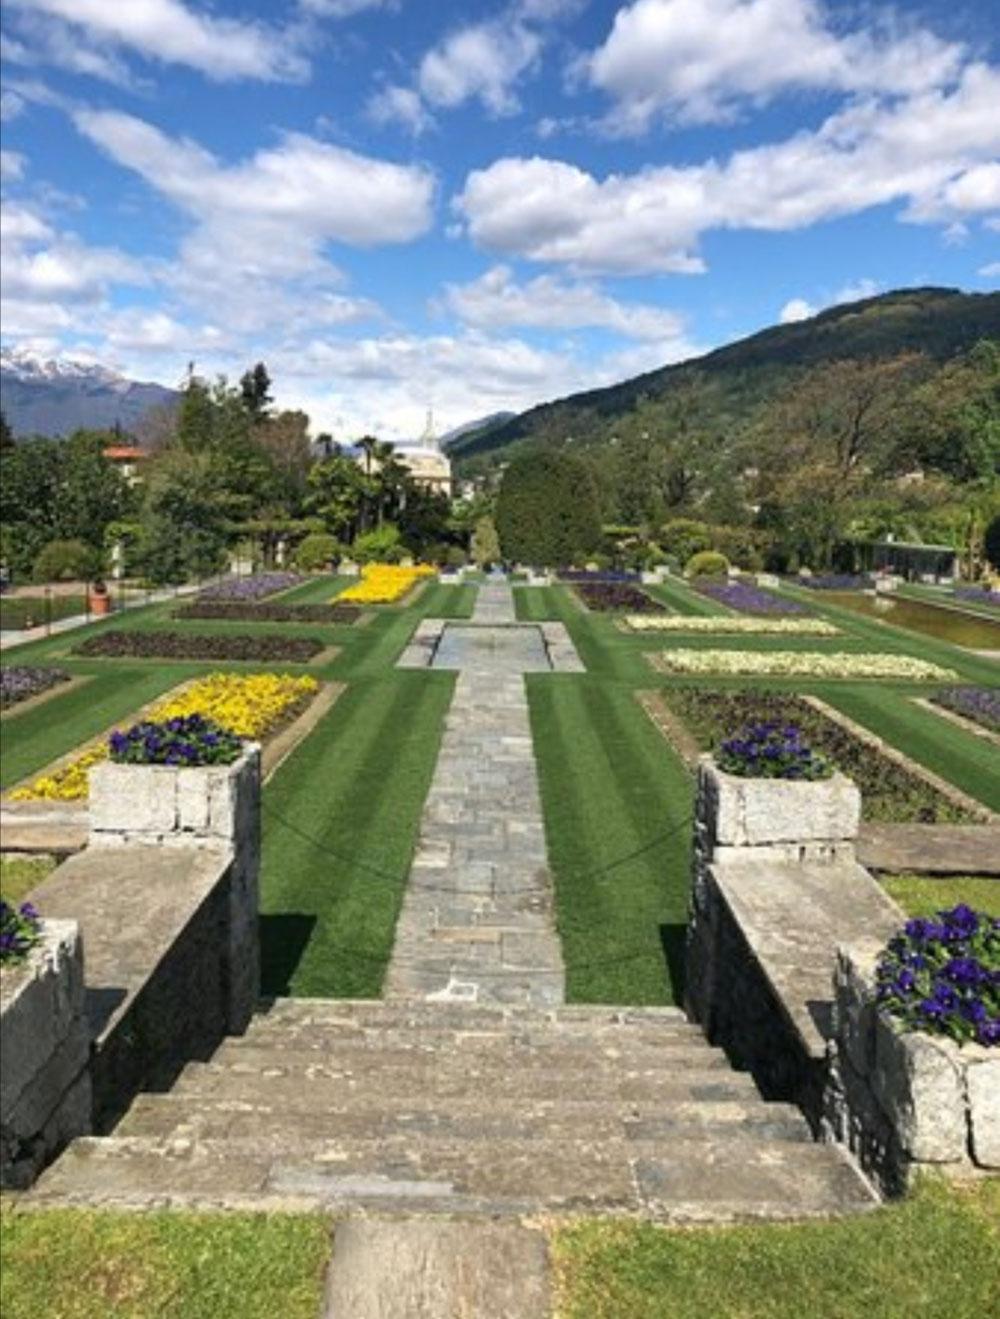 Gardens of Villa Taranto, Verbania